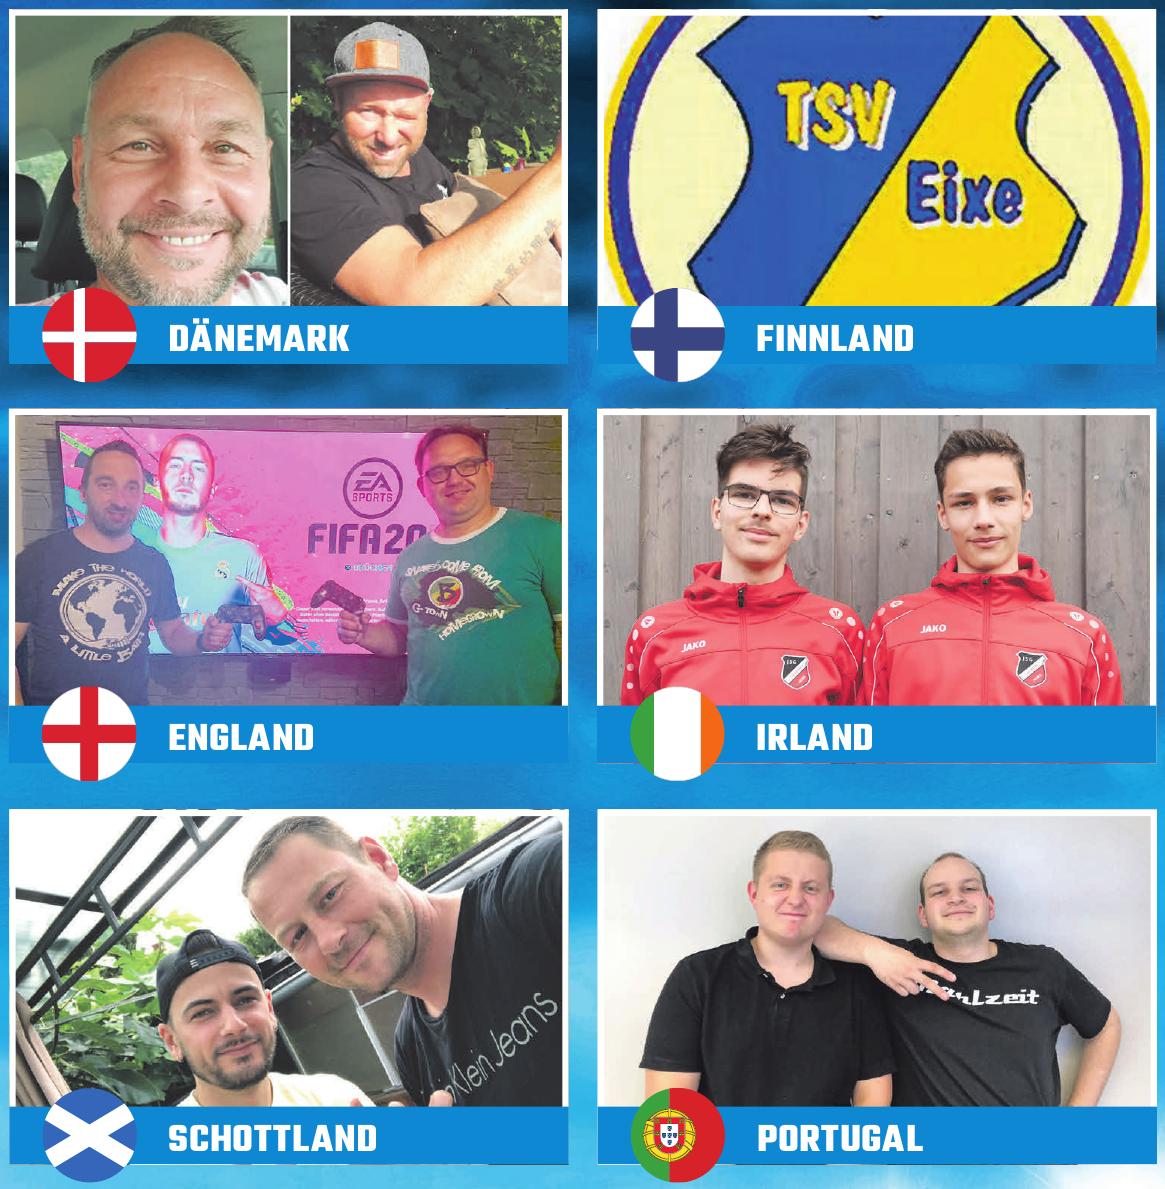 Anpfiff für den E-Soccer-Cup Image 4